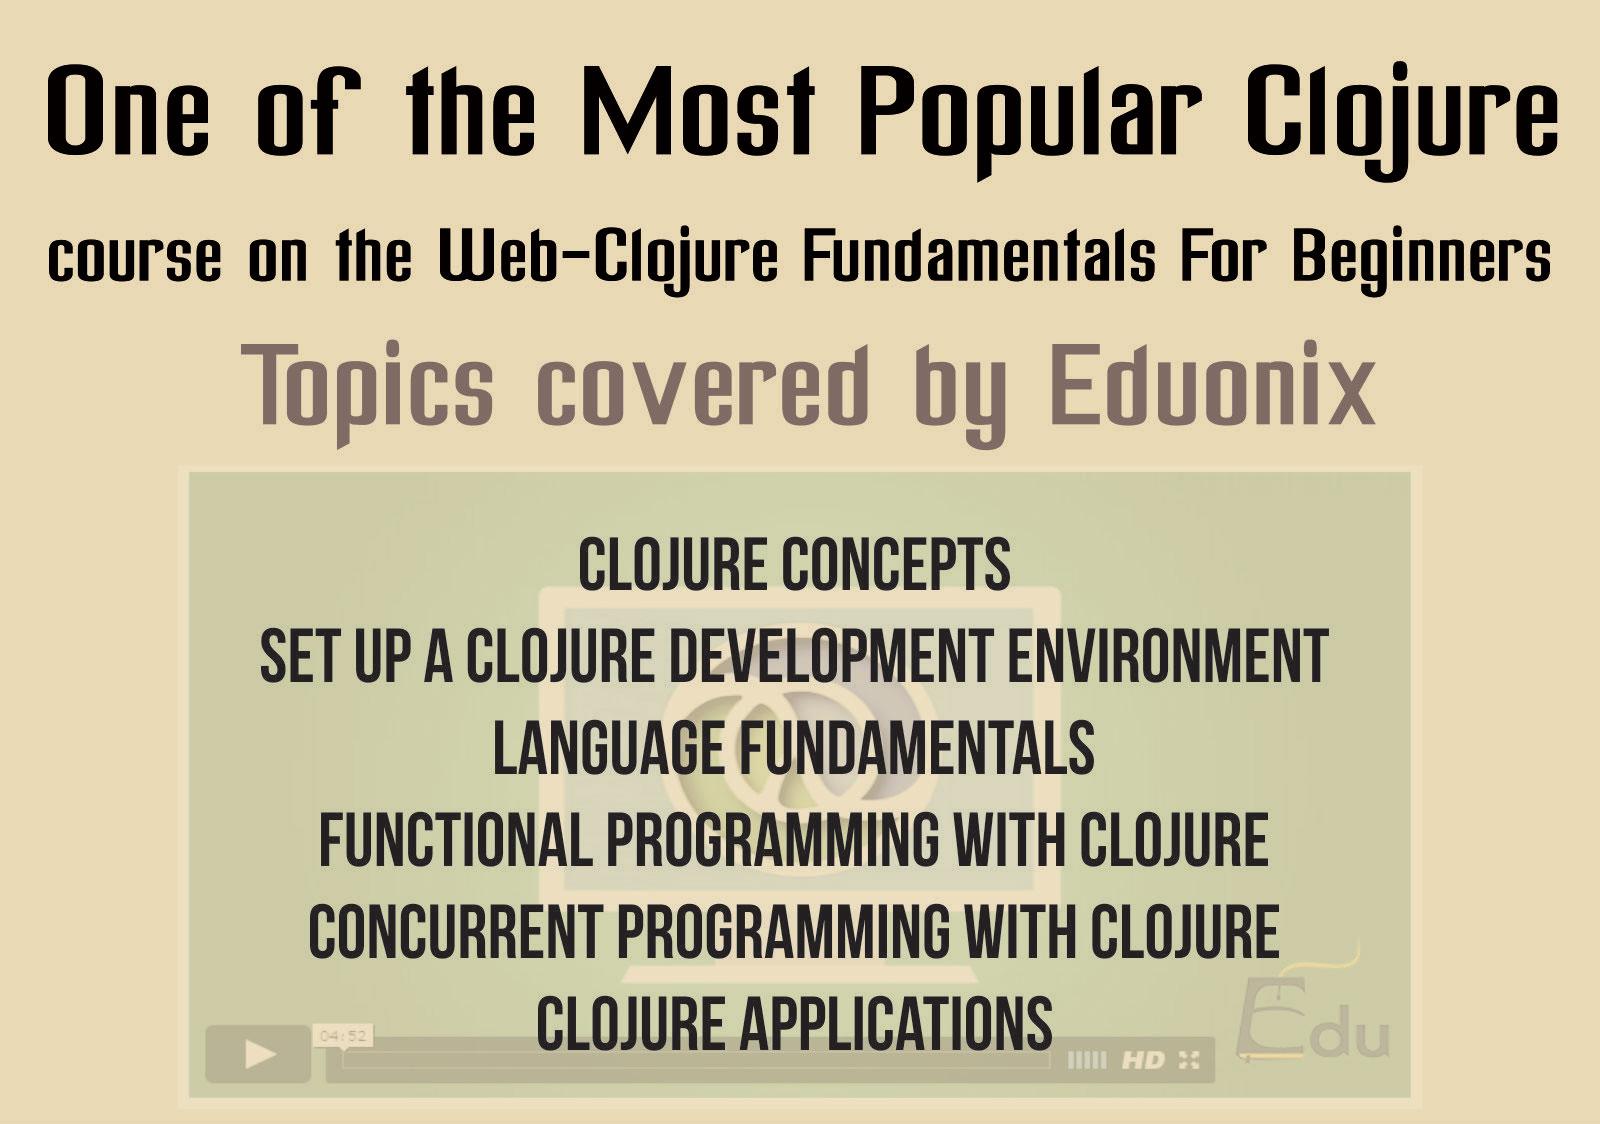 Clojure popular course